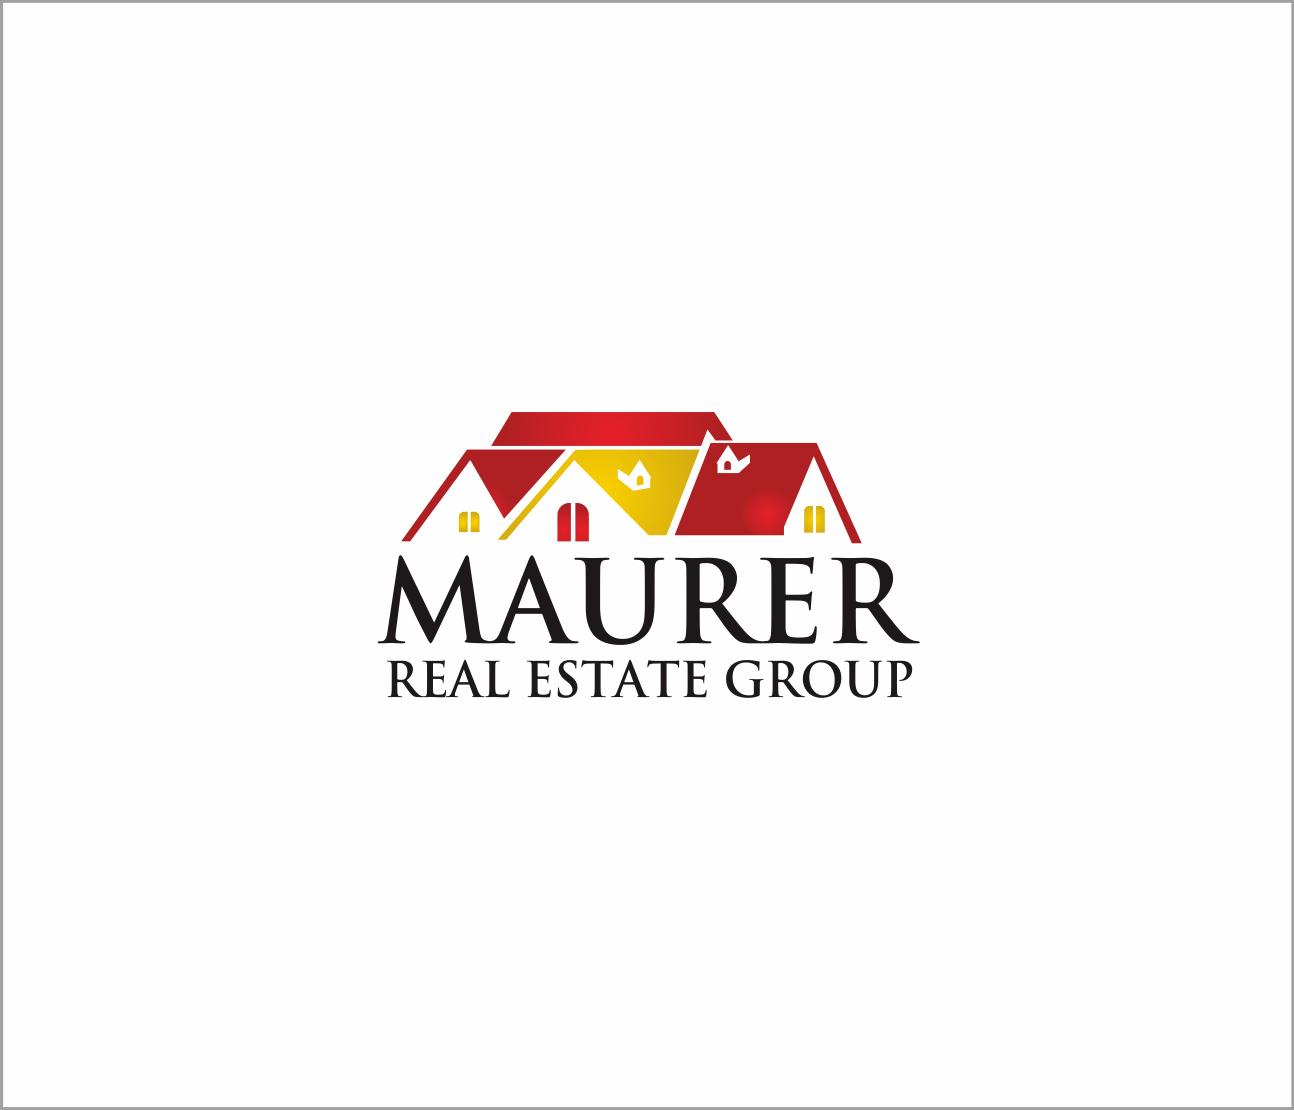 Logo Design by Armada Jamaluddin - Entry No. 86 in the Logo Design Contest Maurer real estate group Logo Design.